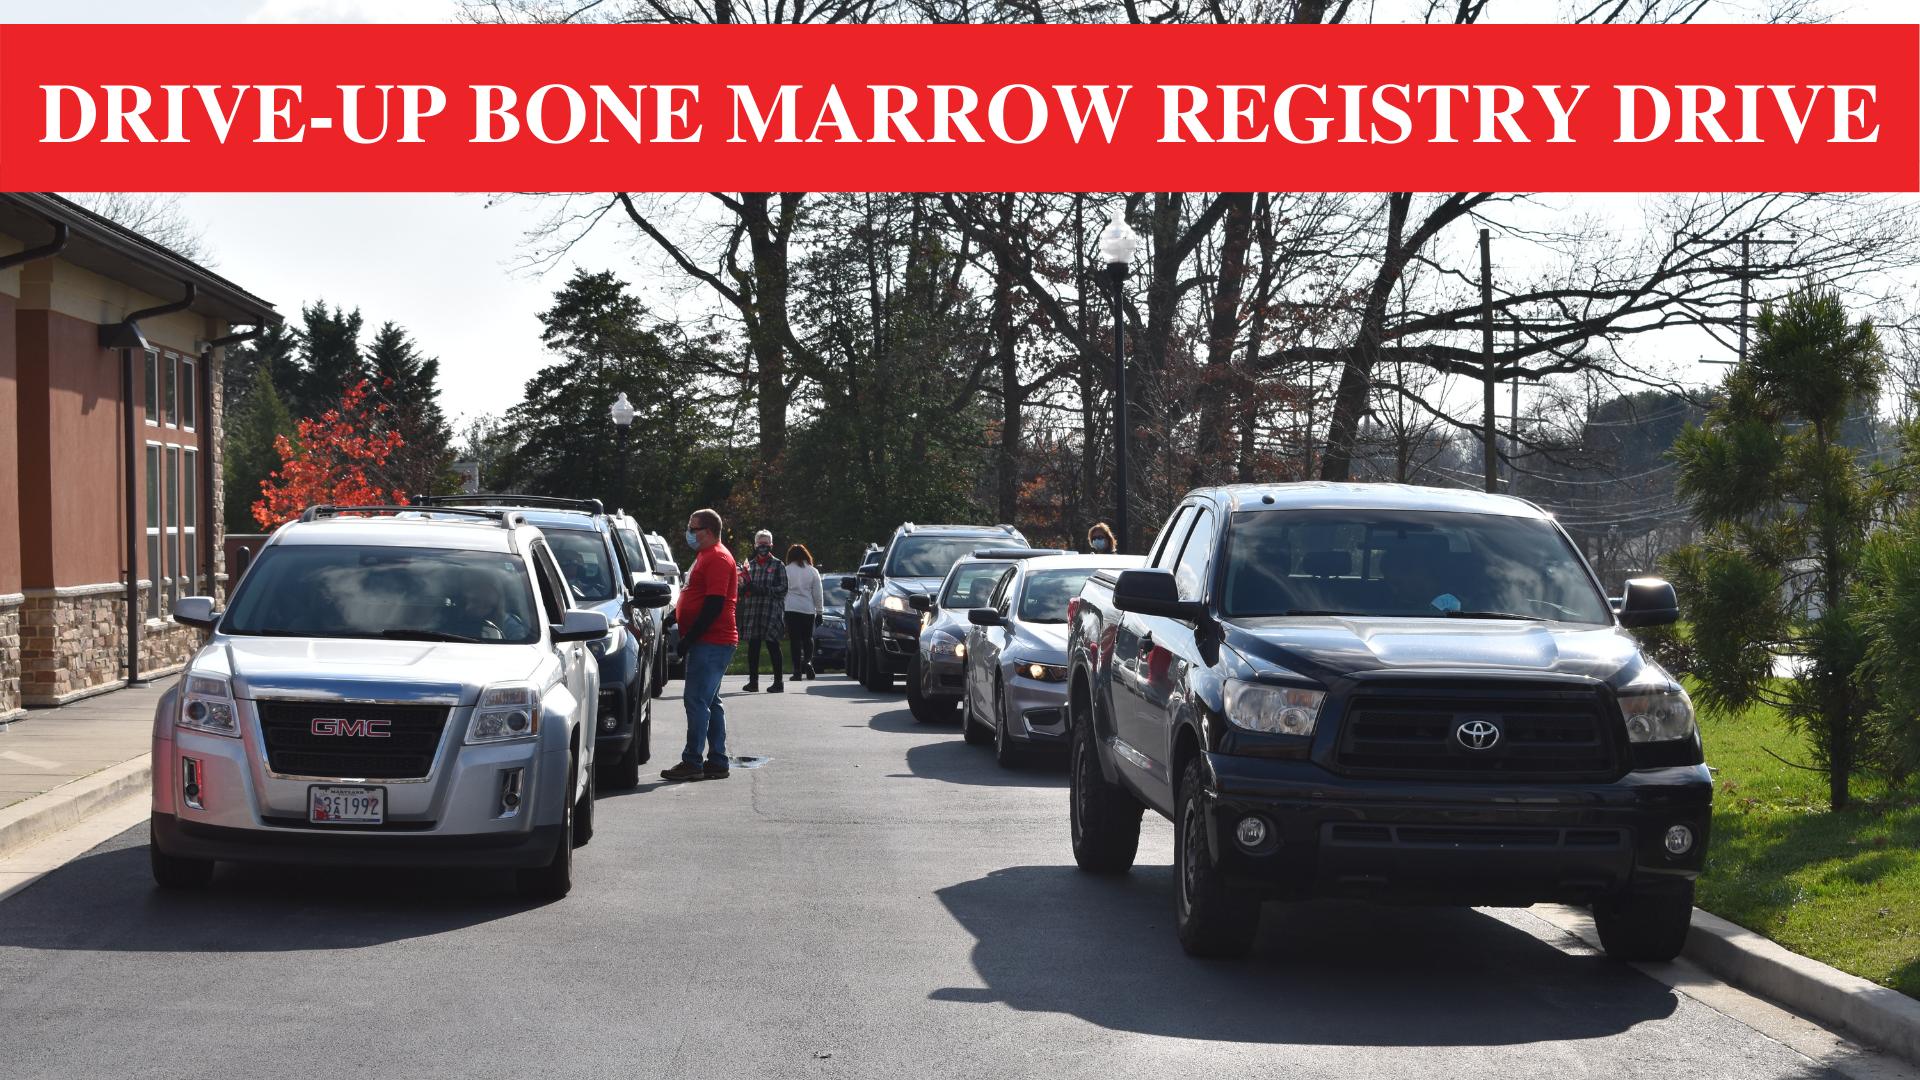 drive-up bone marrow registry drive